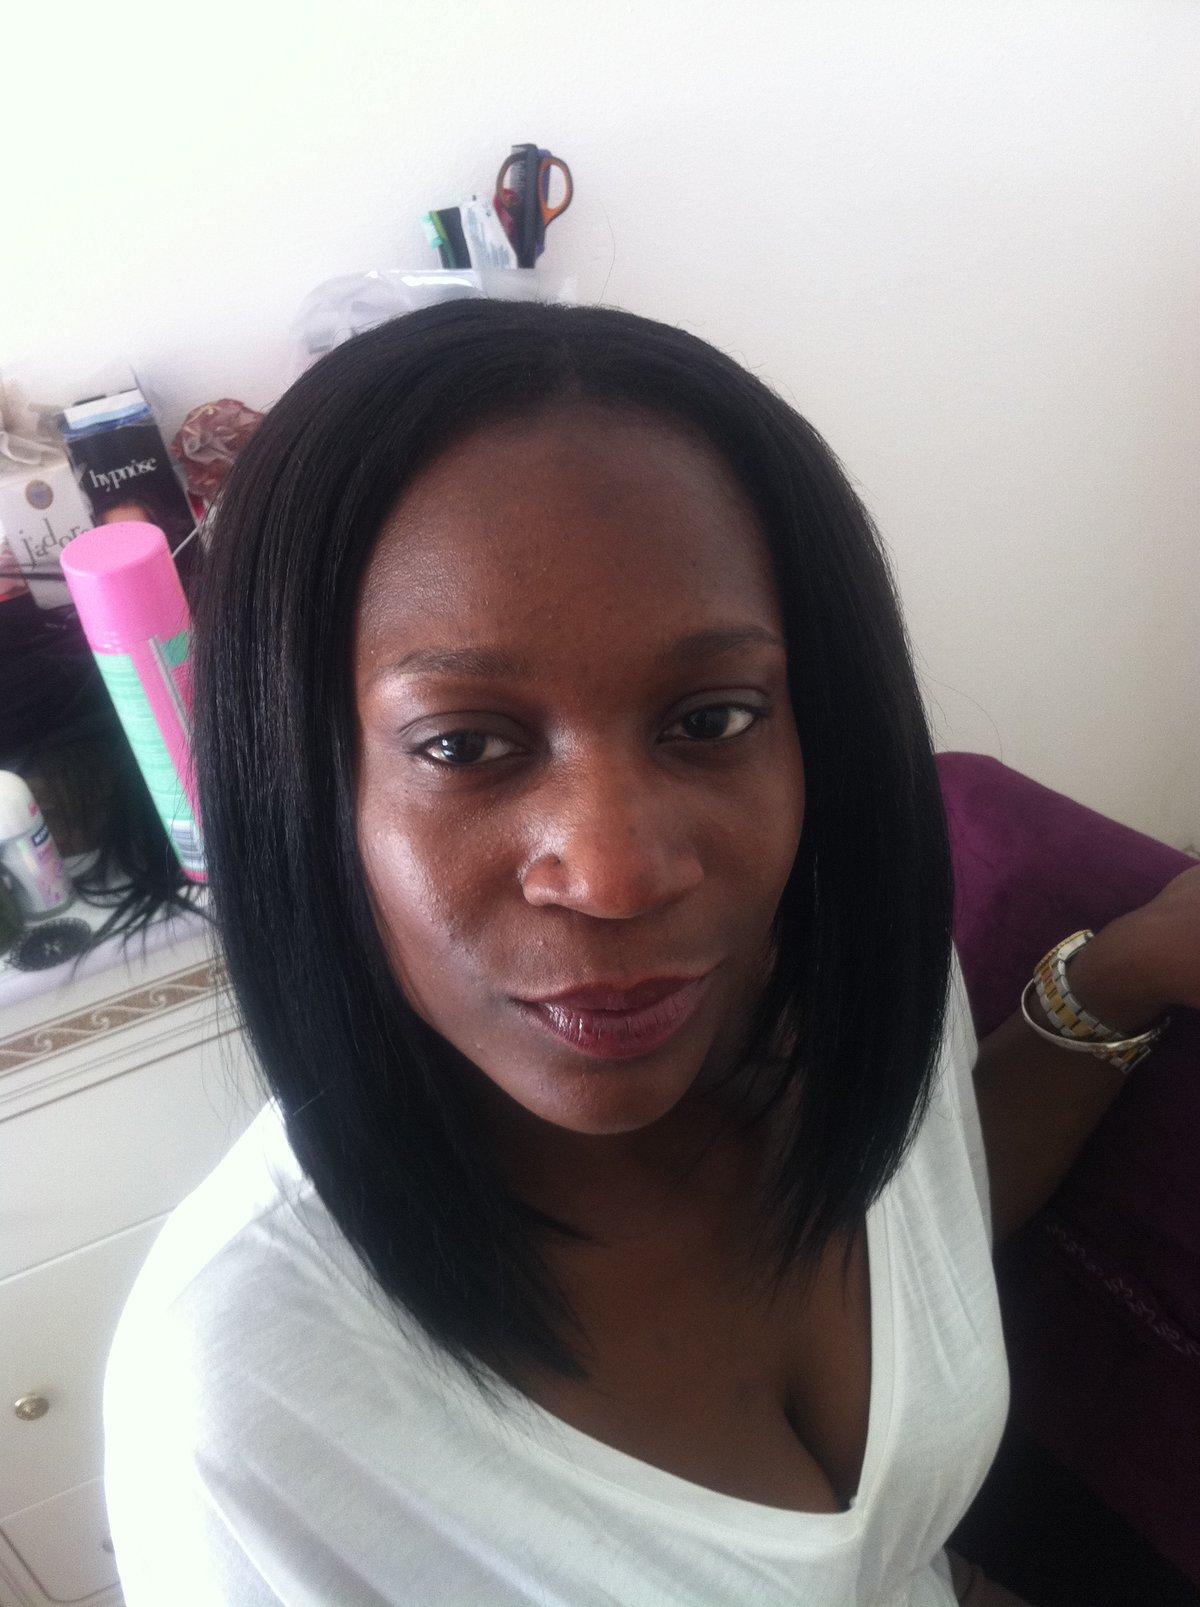 Carr plongeant id es coiffure afro tresses vanille tissage locks braids lissage - Coupe carre plongeant tissage ...